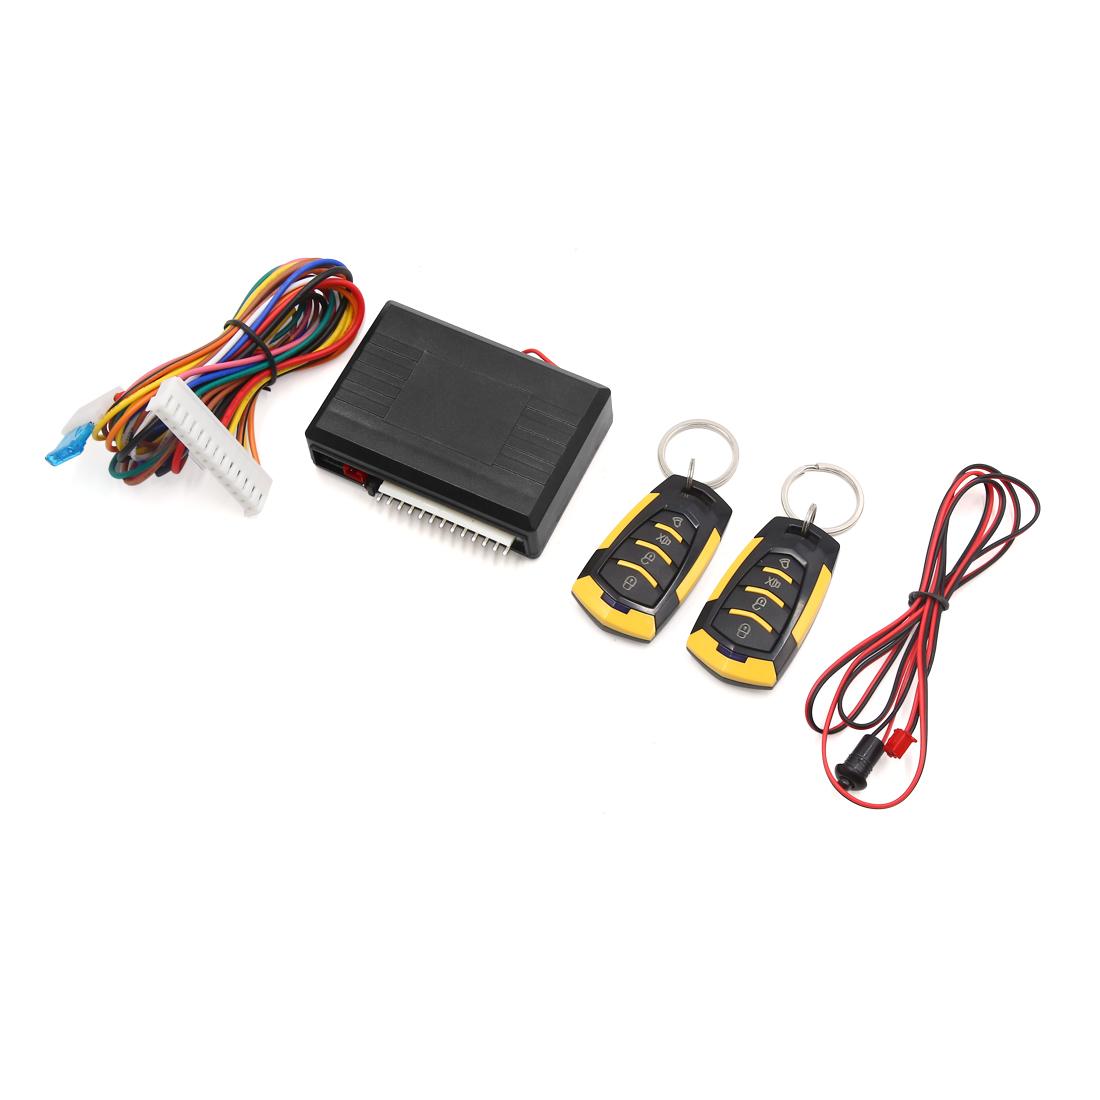 12V Automobile Car Central Door Locking Keyless Entry System w Remote Control